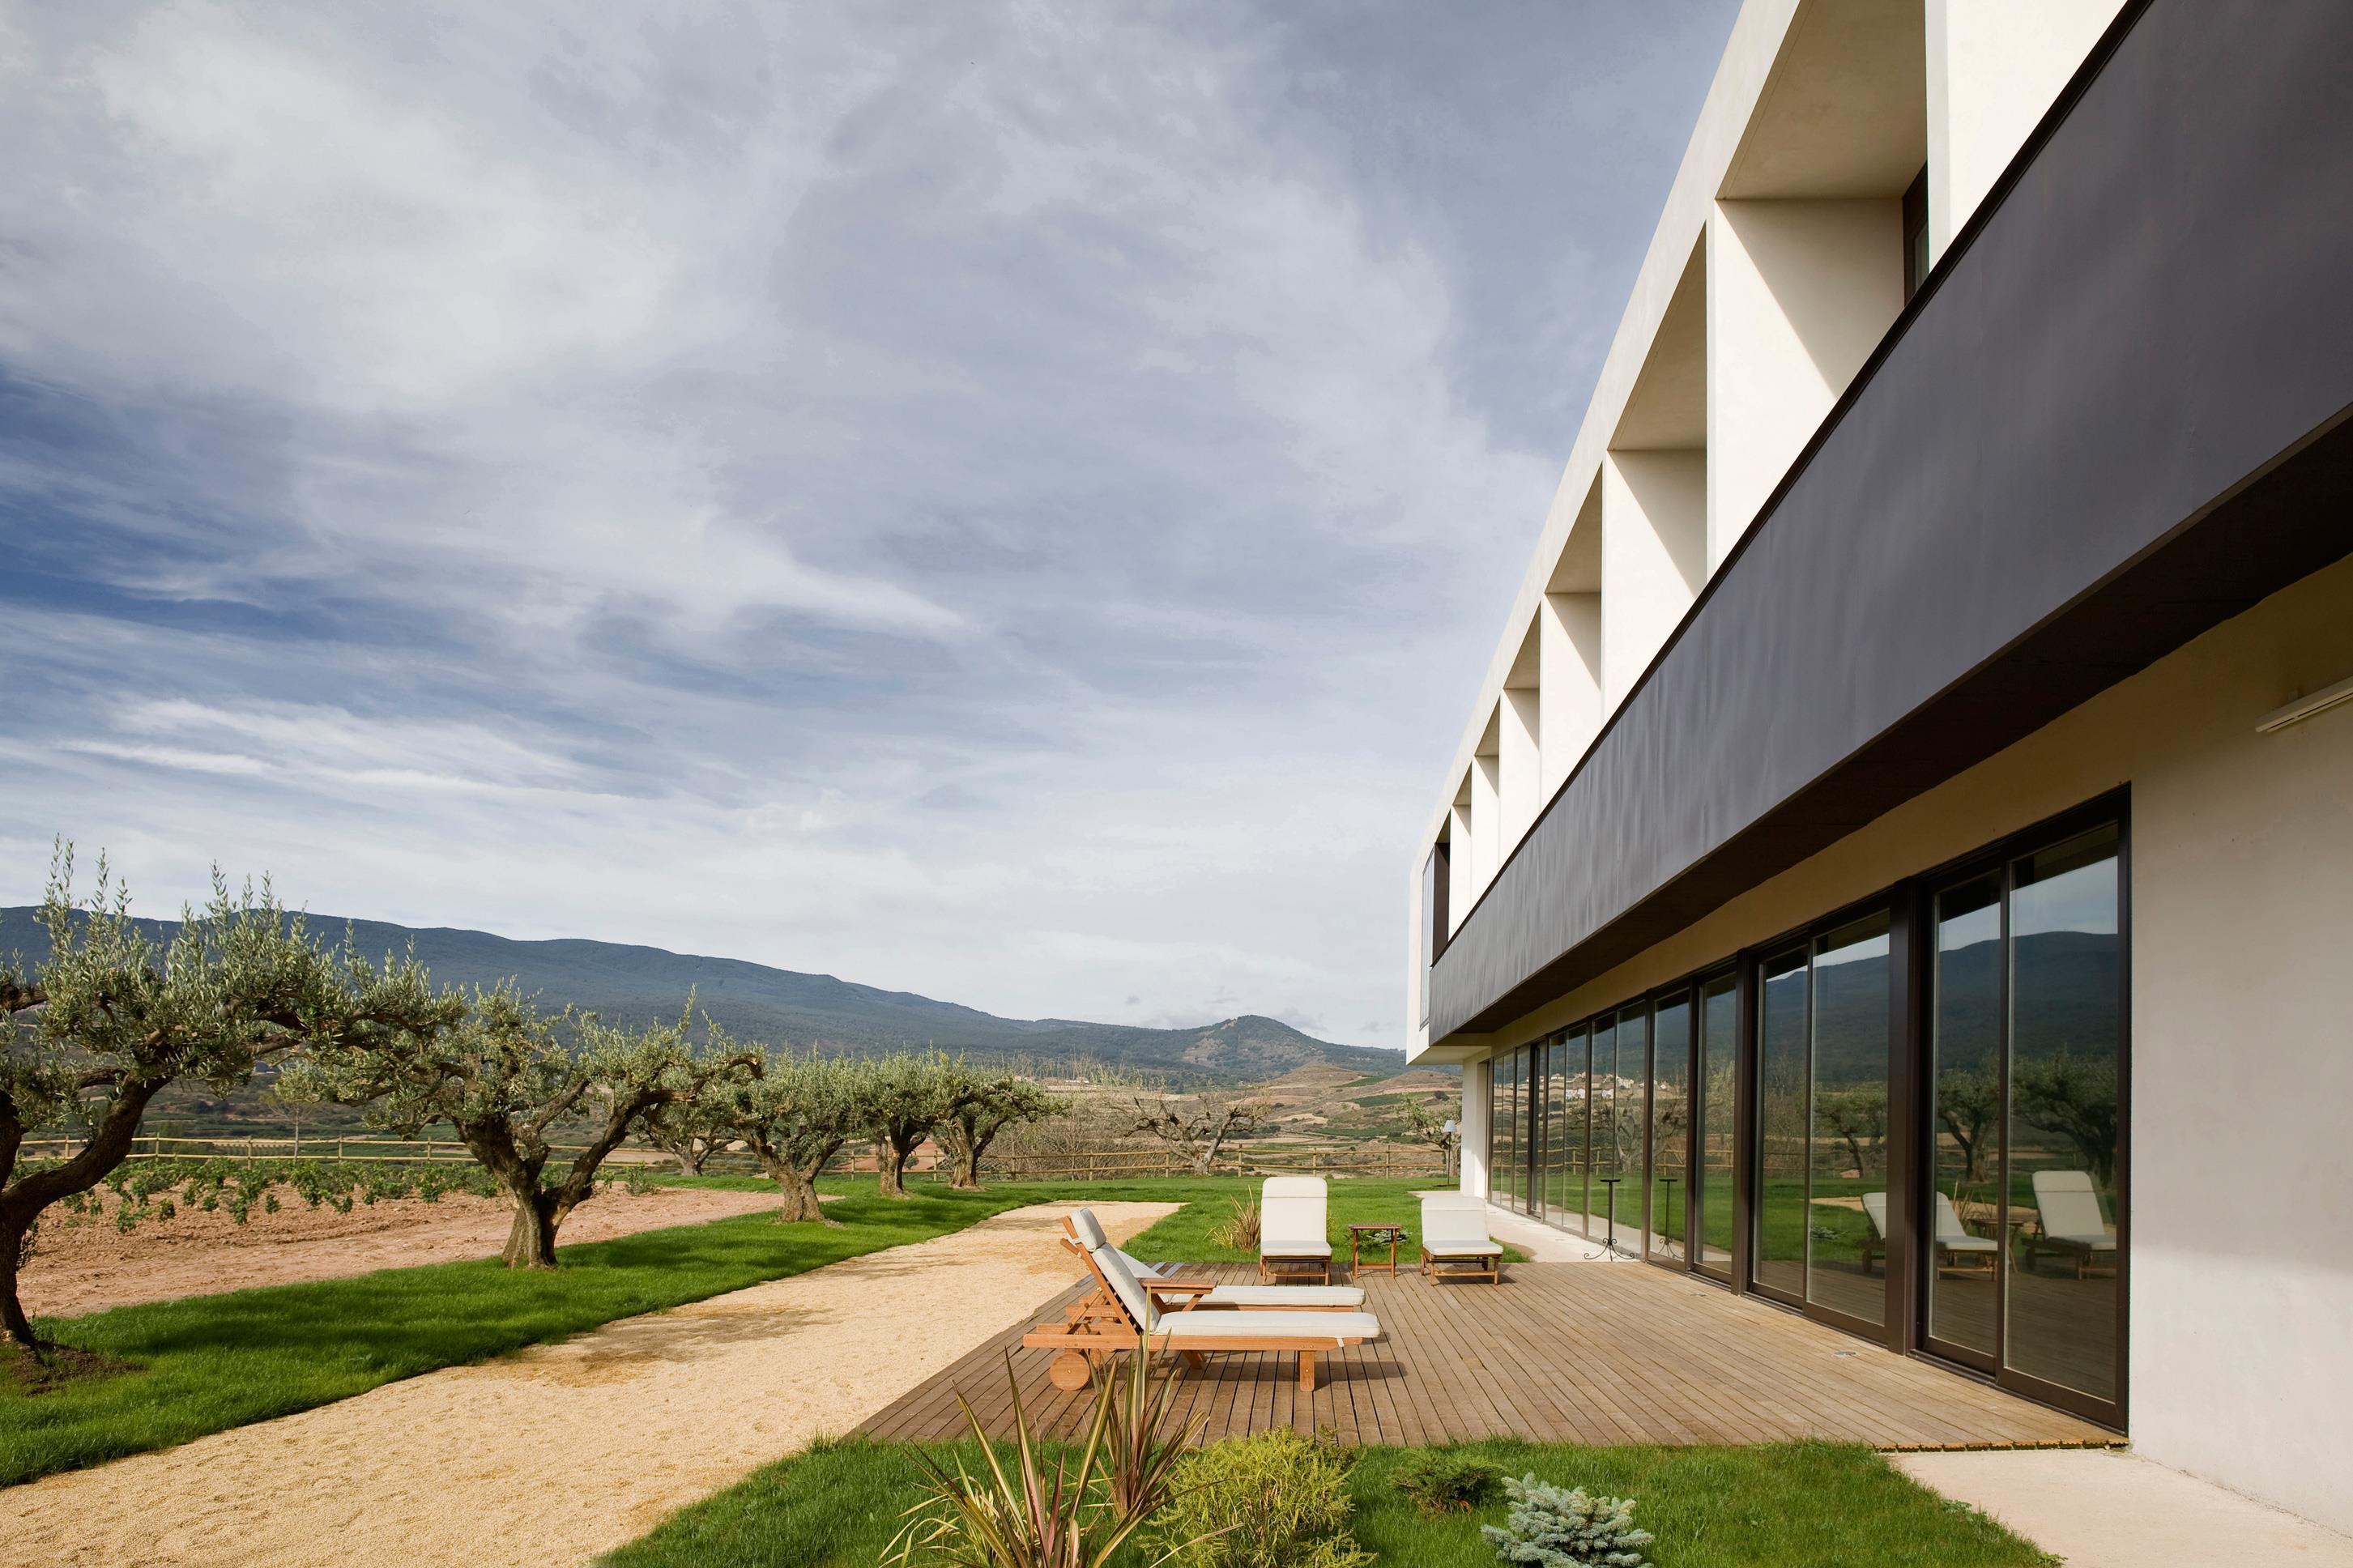 Hotel Finca De Los Arandinos Alojamientos La Rioja Turismo